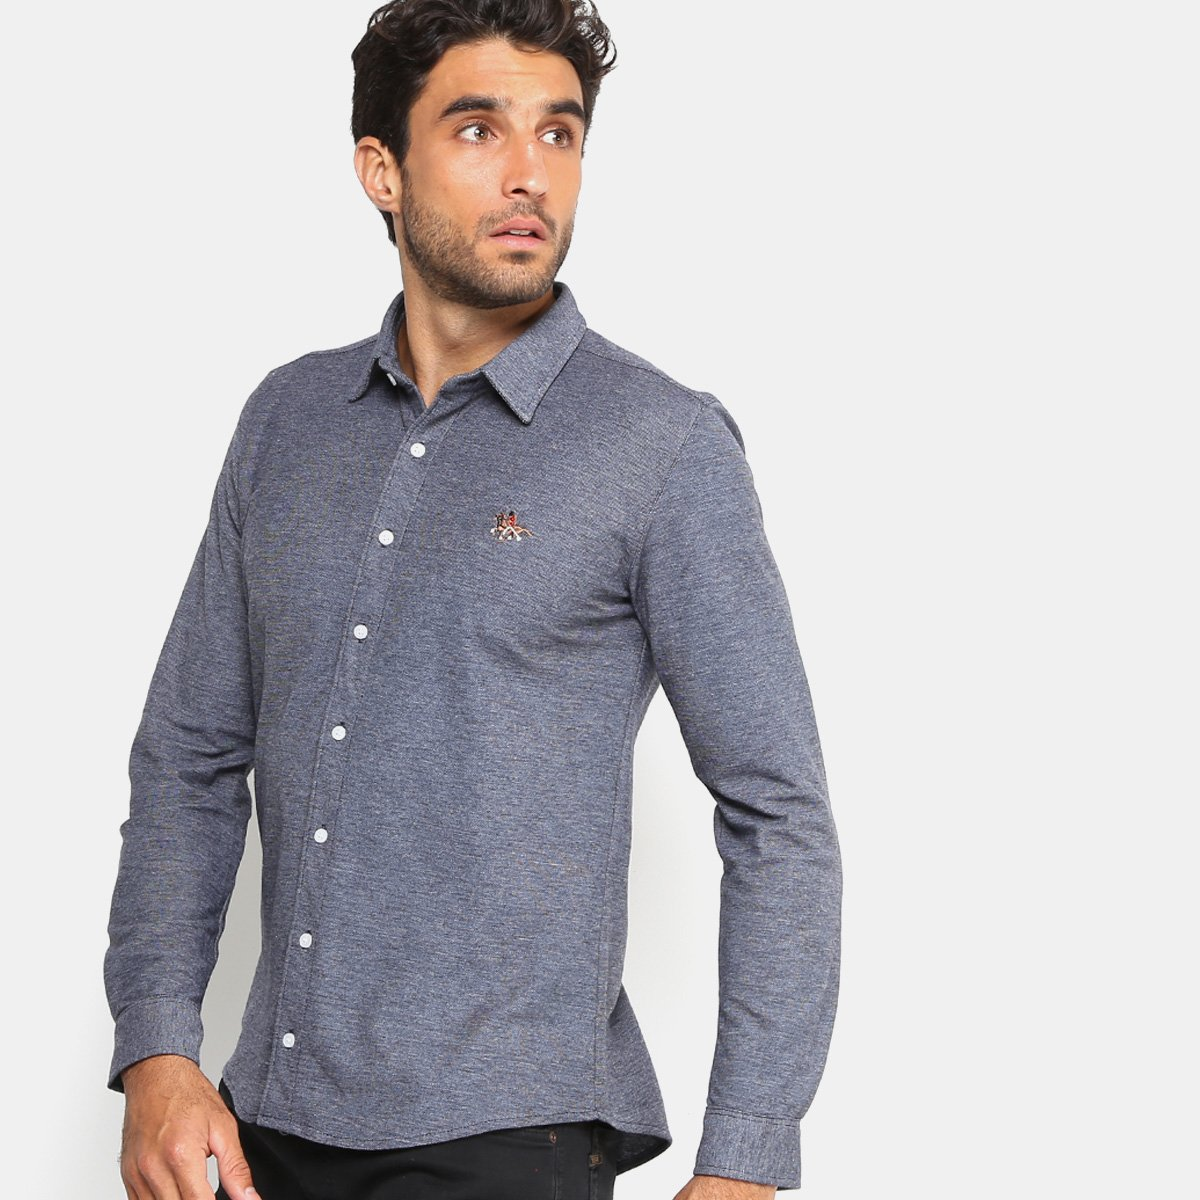 76a3e12298 Camisa RG 518 Bordado Malha Masculina - Tam: P - Shopping TudoAzul